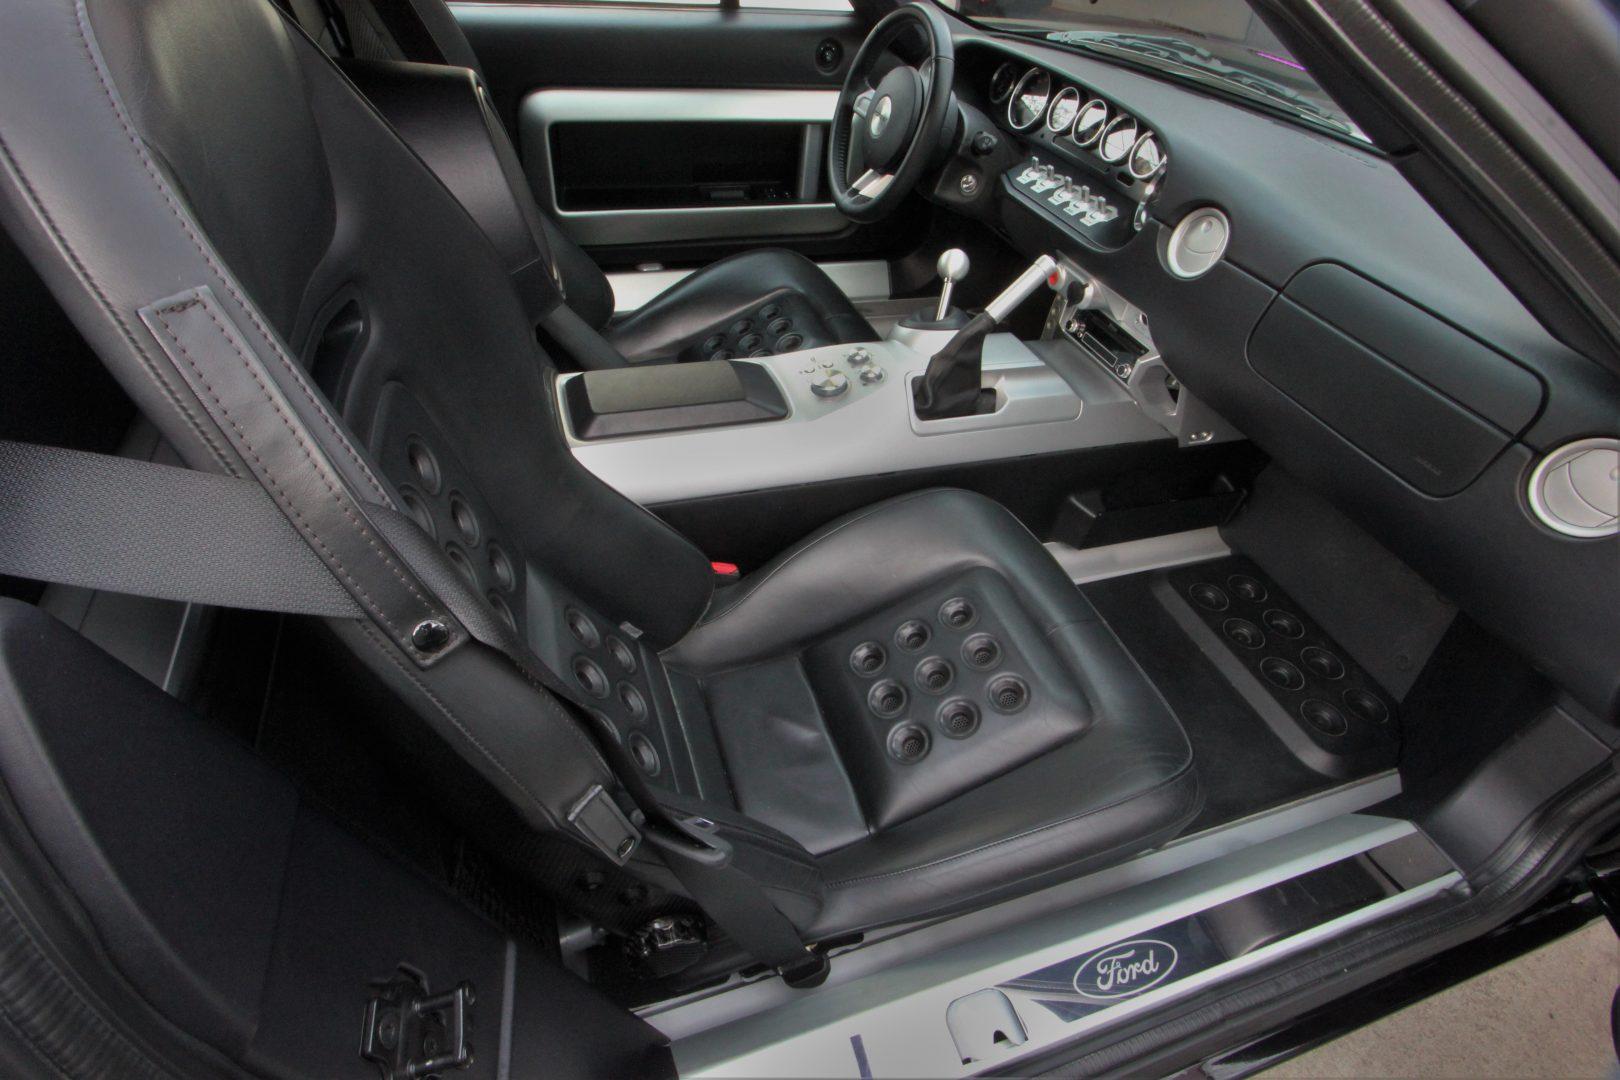 AIL Ford GT 5.4L V8 Supercharger 13